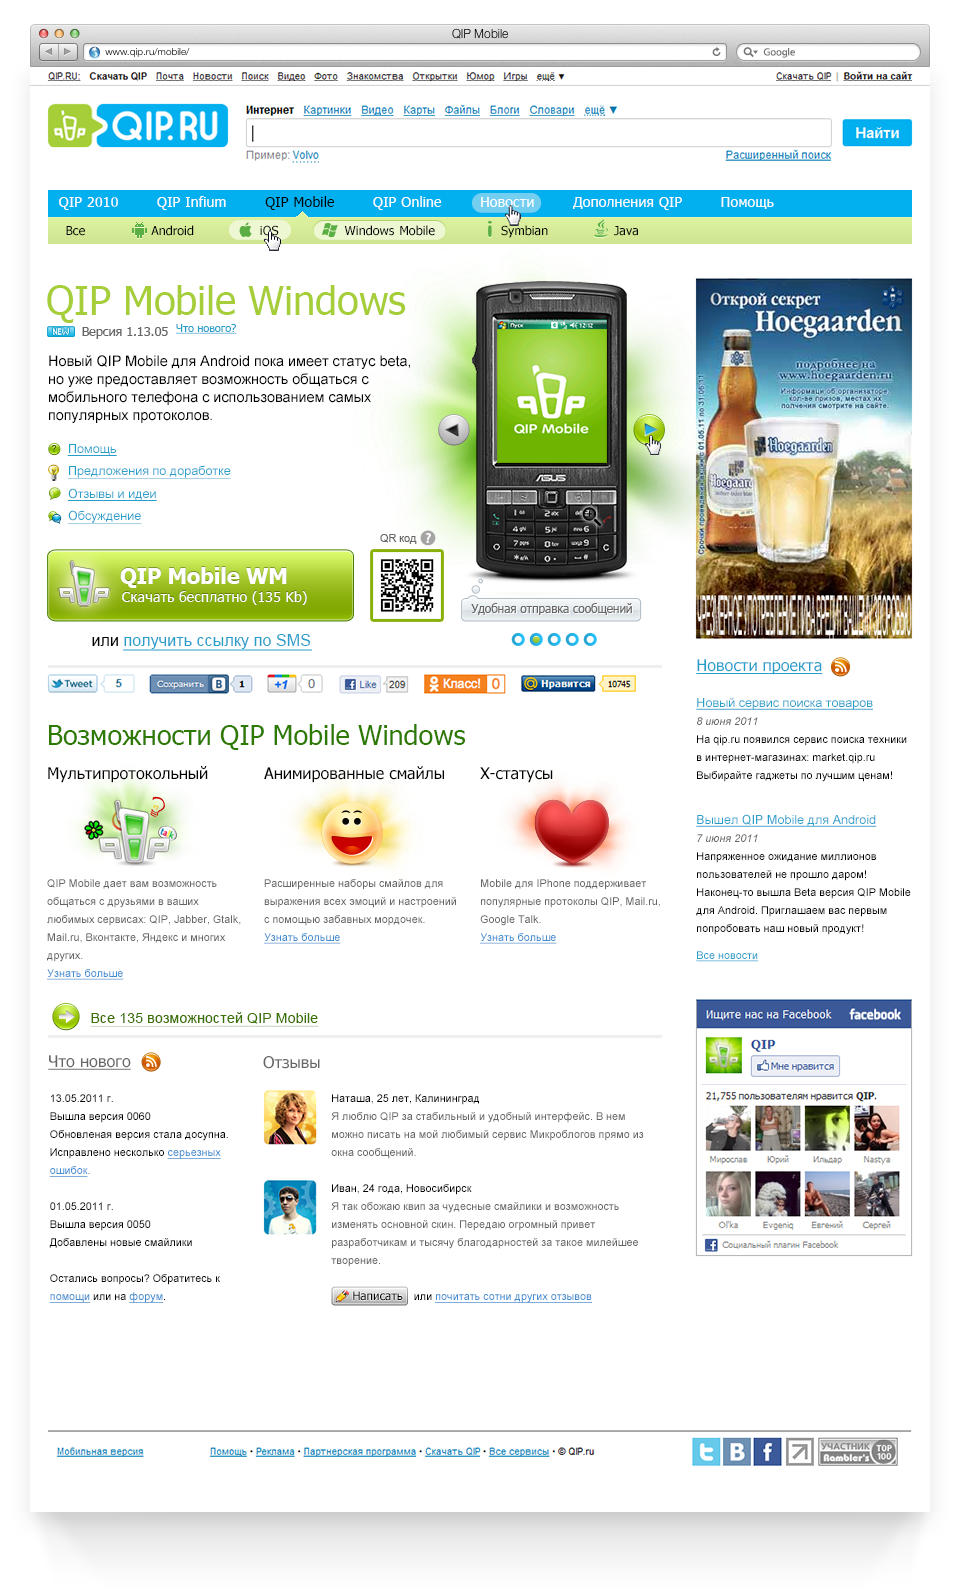 Qip mobile - скачать qip mobile для windows mobile build 2140 операционка, windows mobile 5, 6 standard, 61 standard